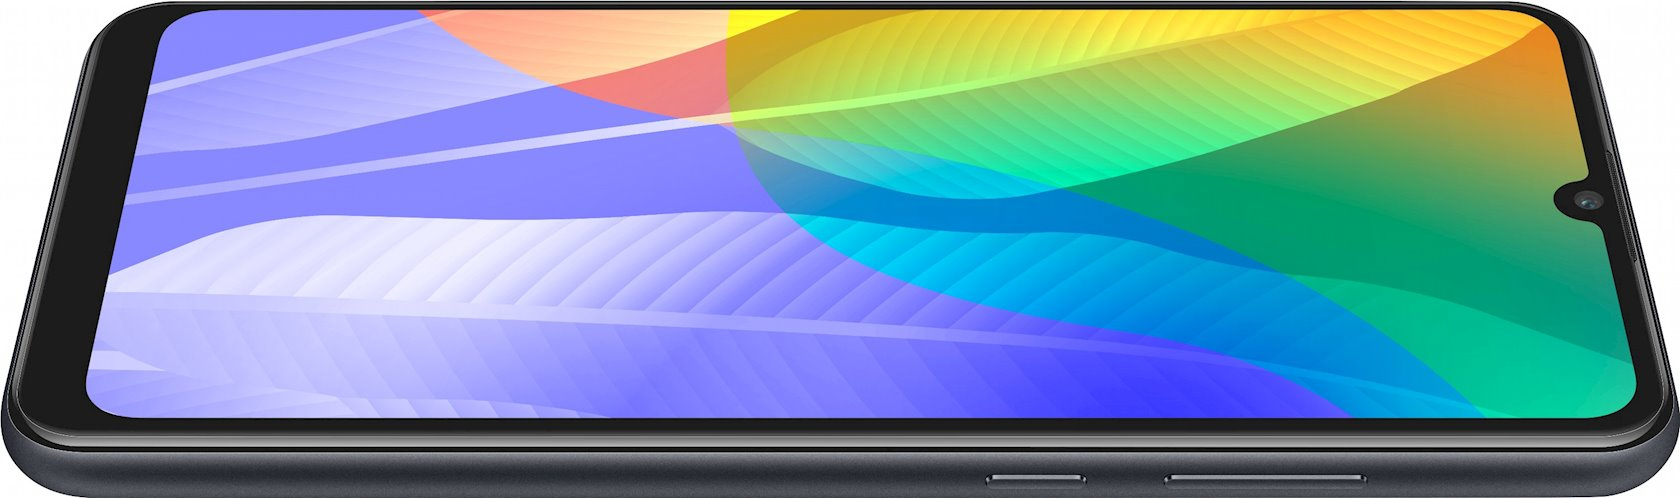 Smartfon Huawei Y6p 64 Gb Midnight Black